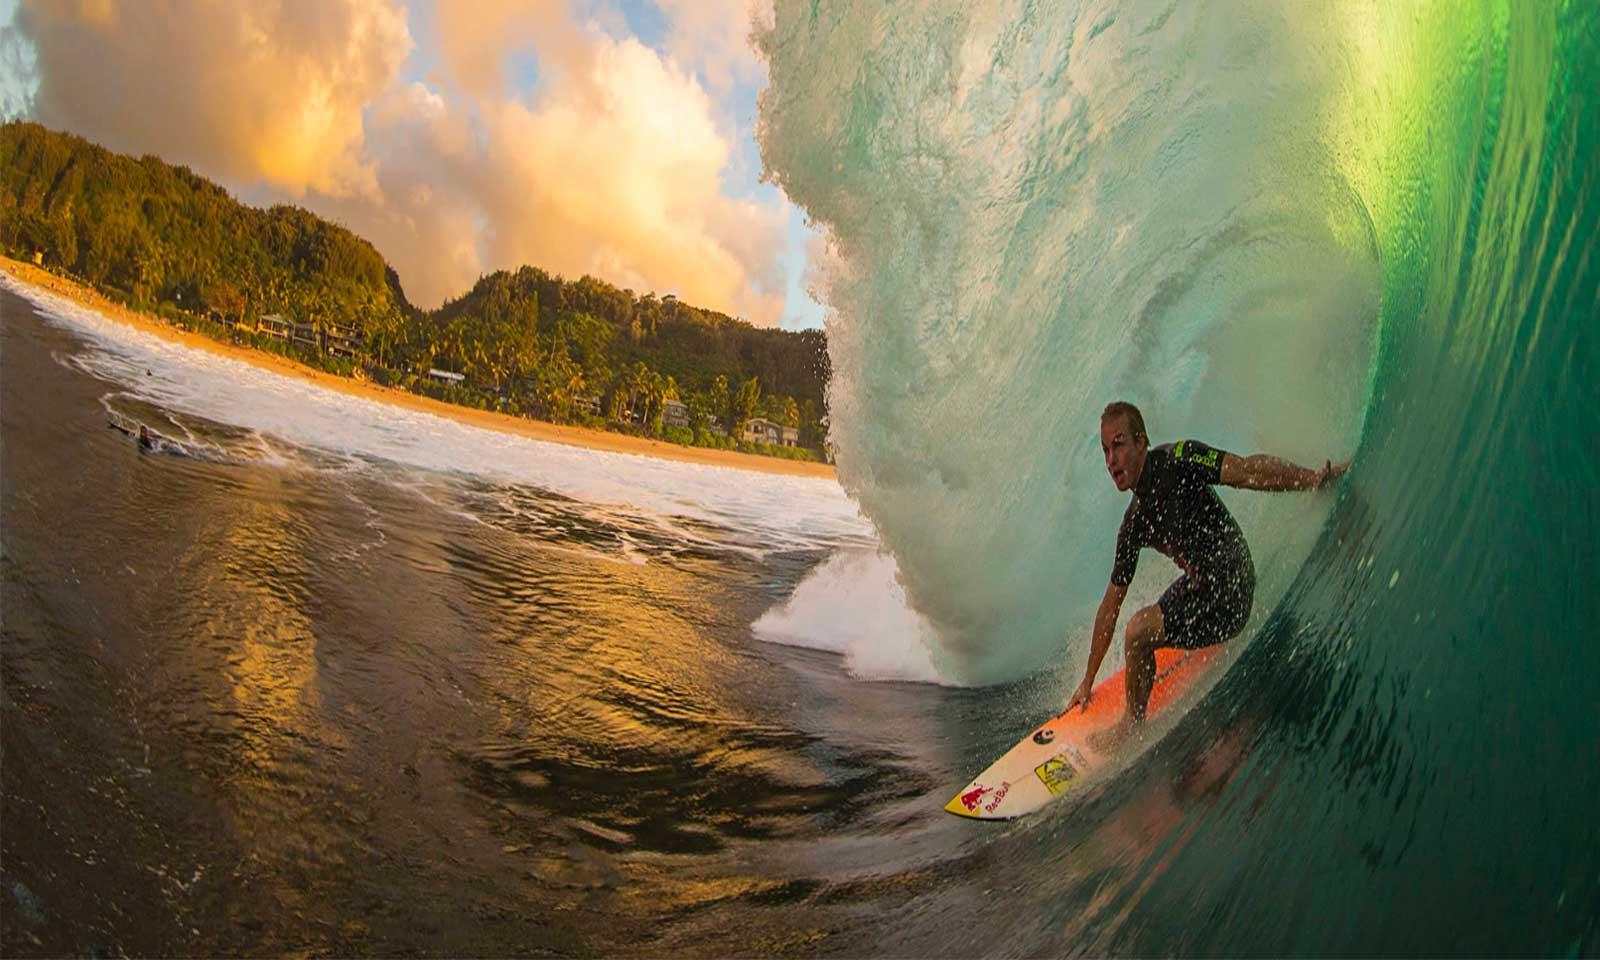 Surfer yt